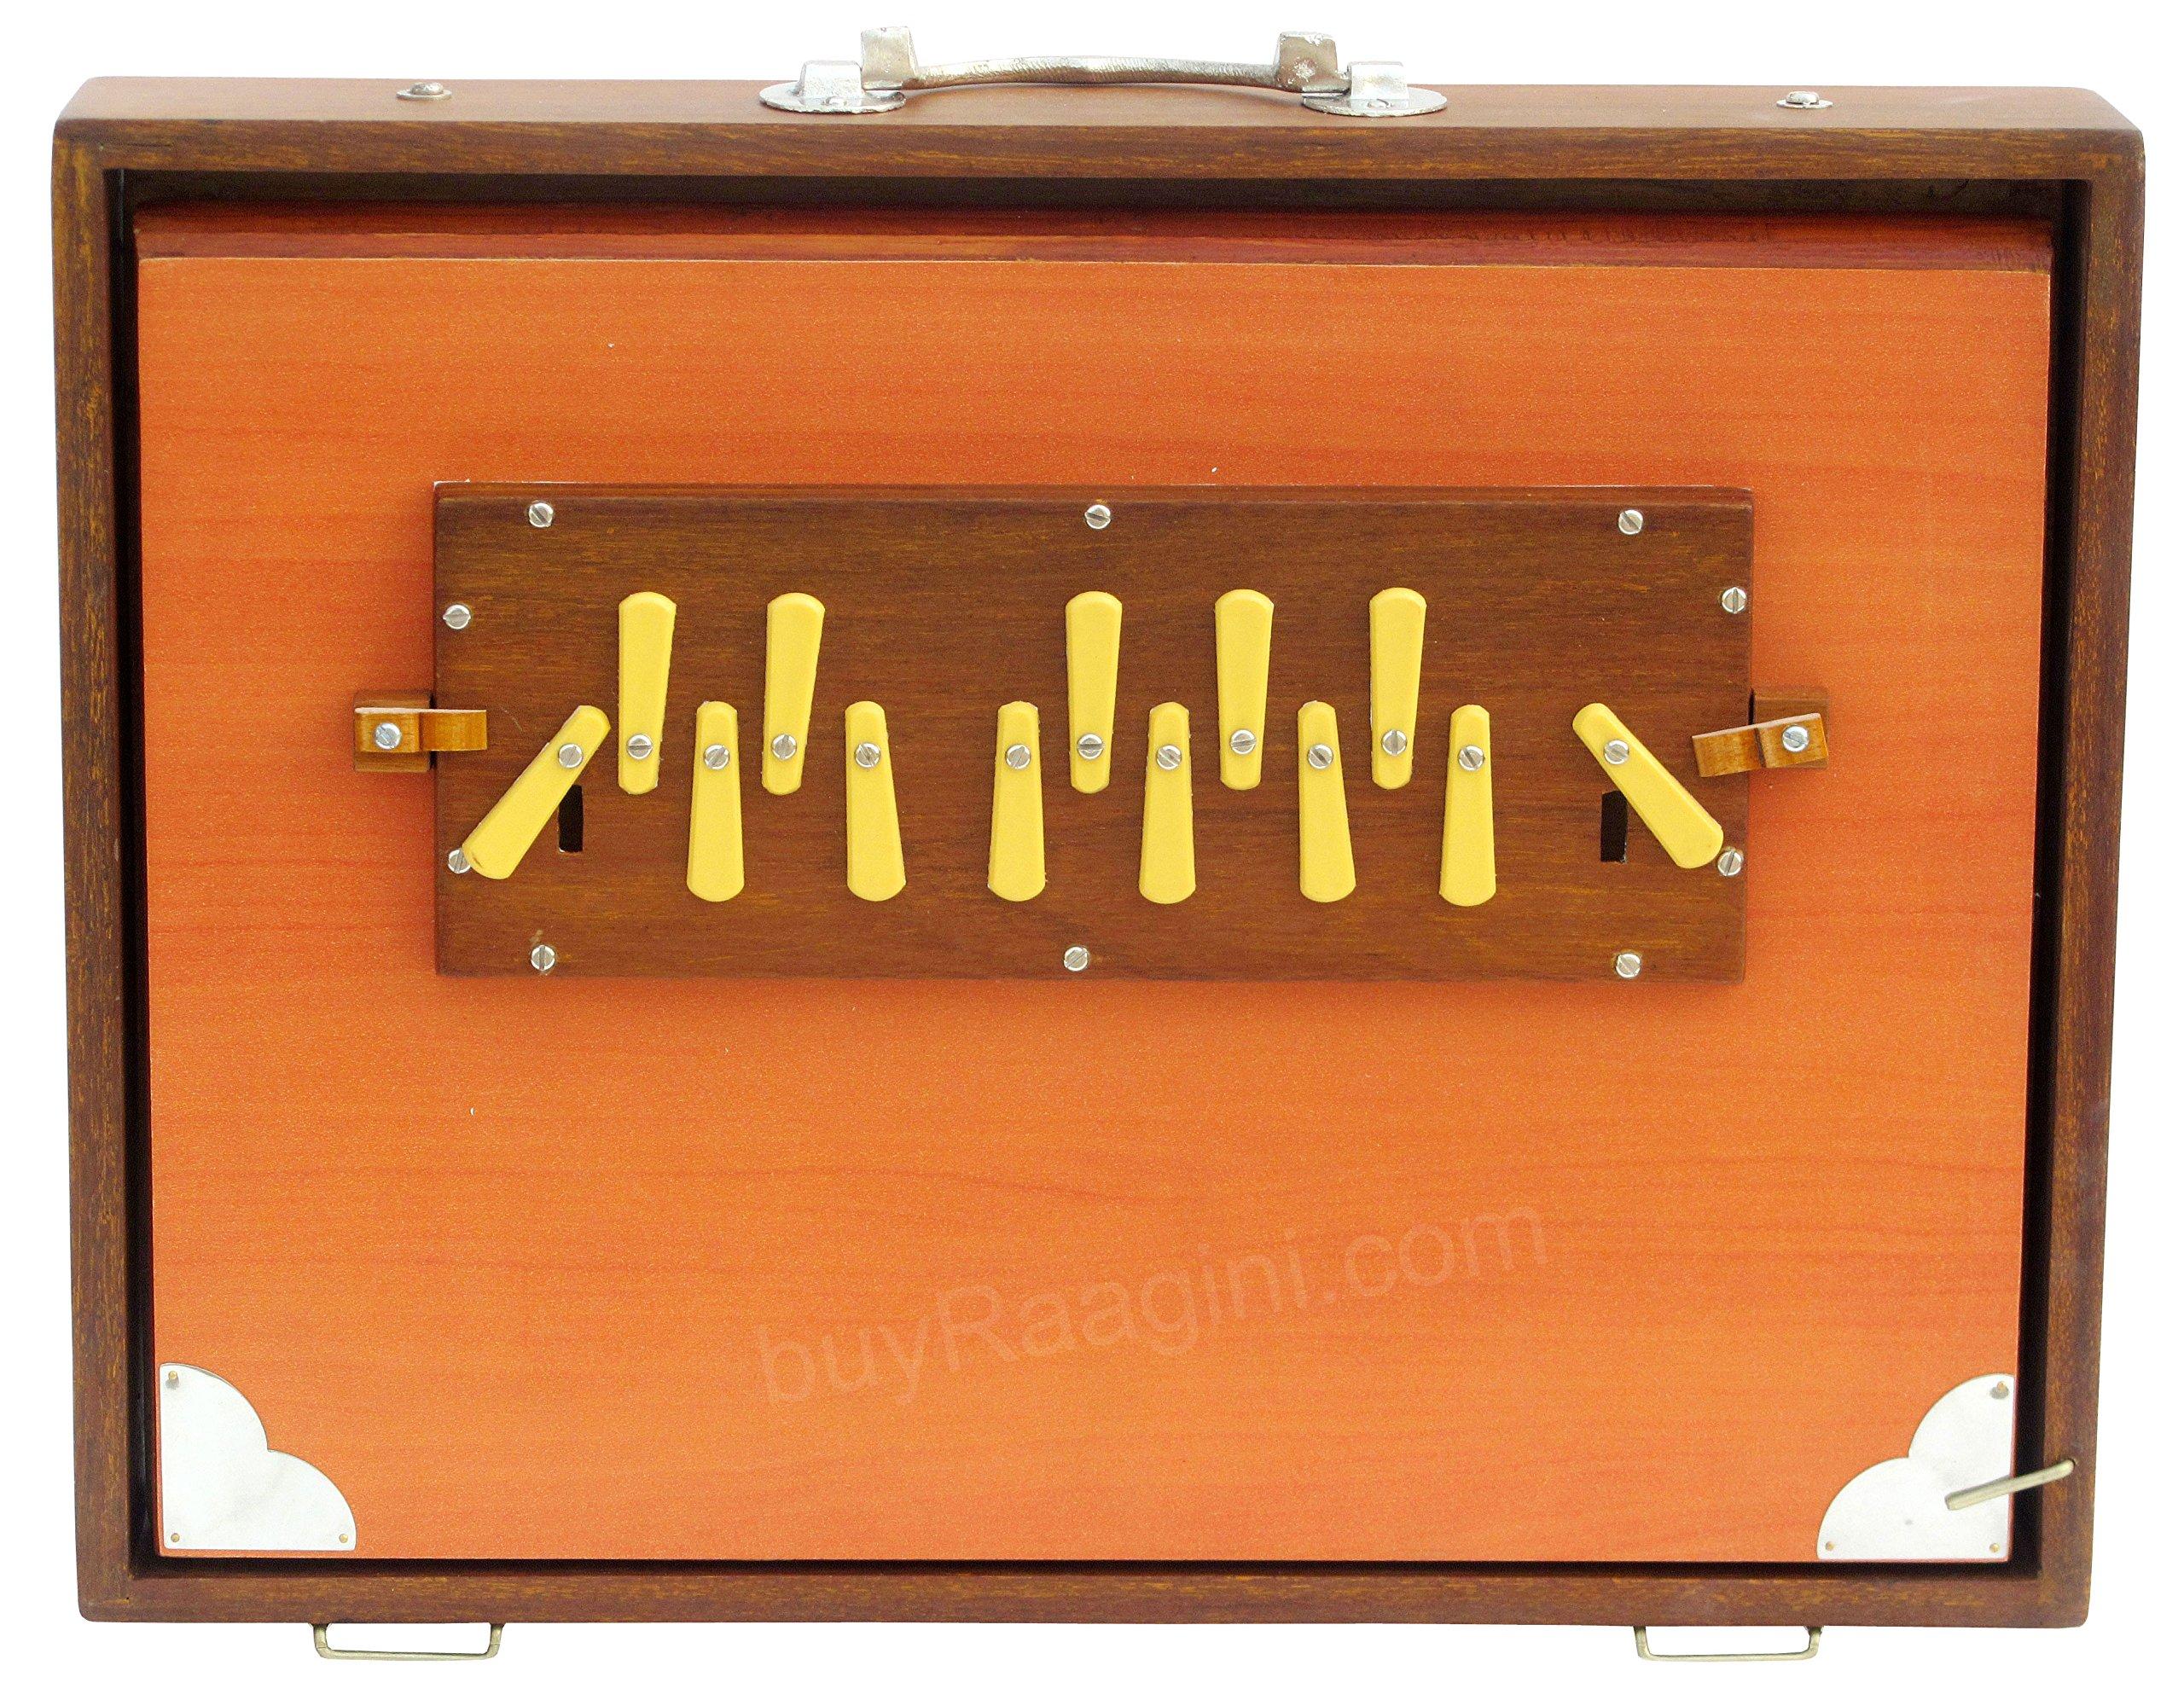 Shruti Box, Maharaja Musicals, Large, Natural Color, 16x12x3 Inches, 13 Notes, Surpeti, Sur Peti, Long Sustain, Professional Quality Shruthi Box, With Bag (PDI-BCG)